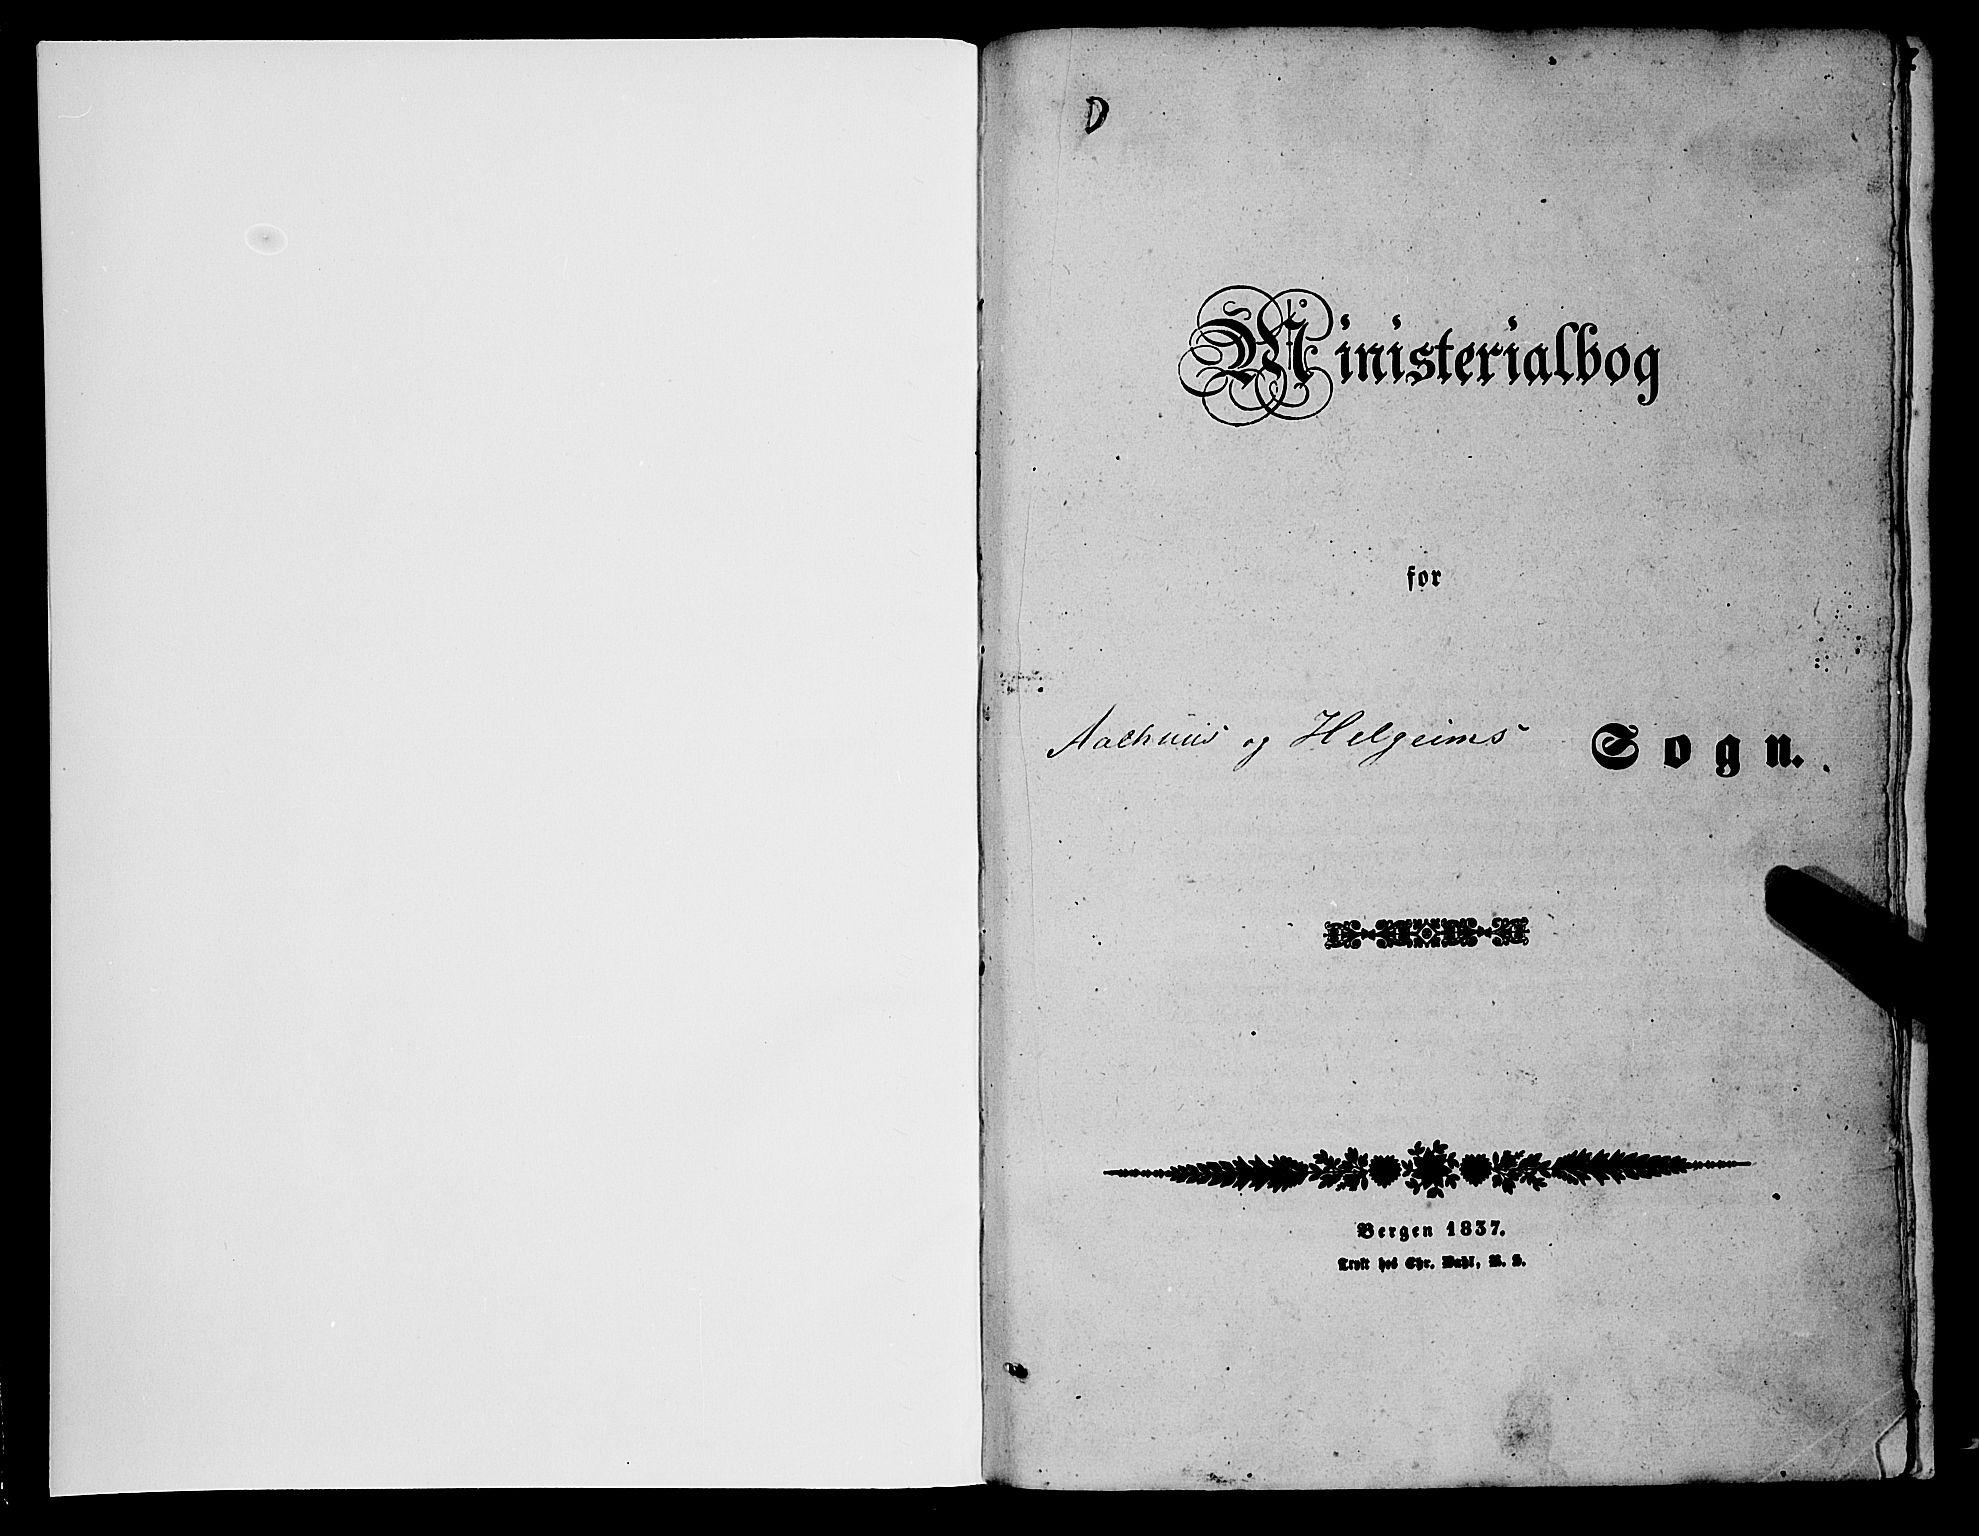 SAB, Jølster sokneprestembete, H/Haa/Haaa/L0010: Parish register (official) no. A 10, 1847-1865